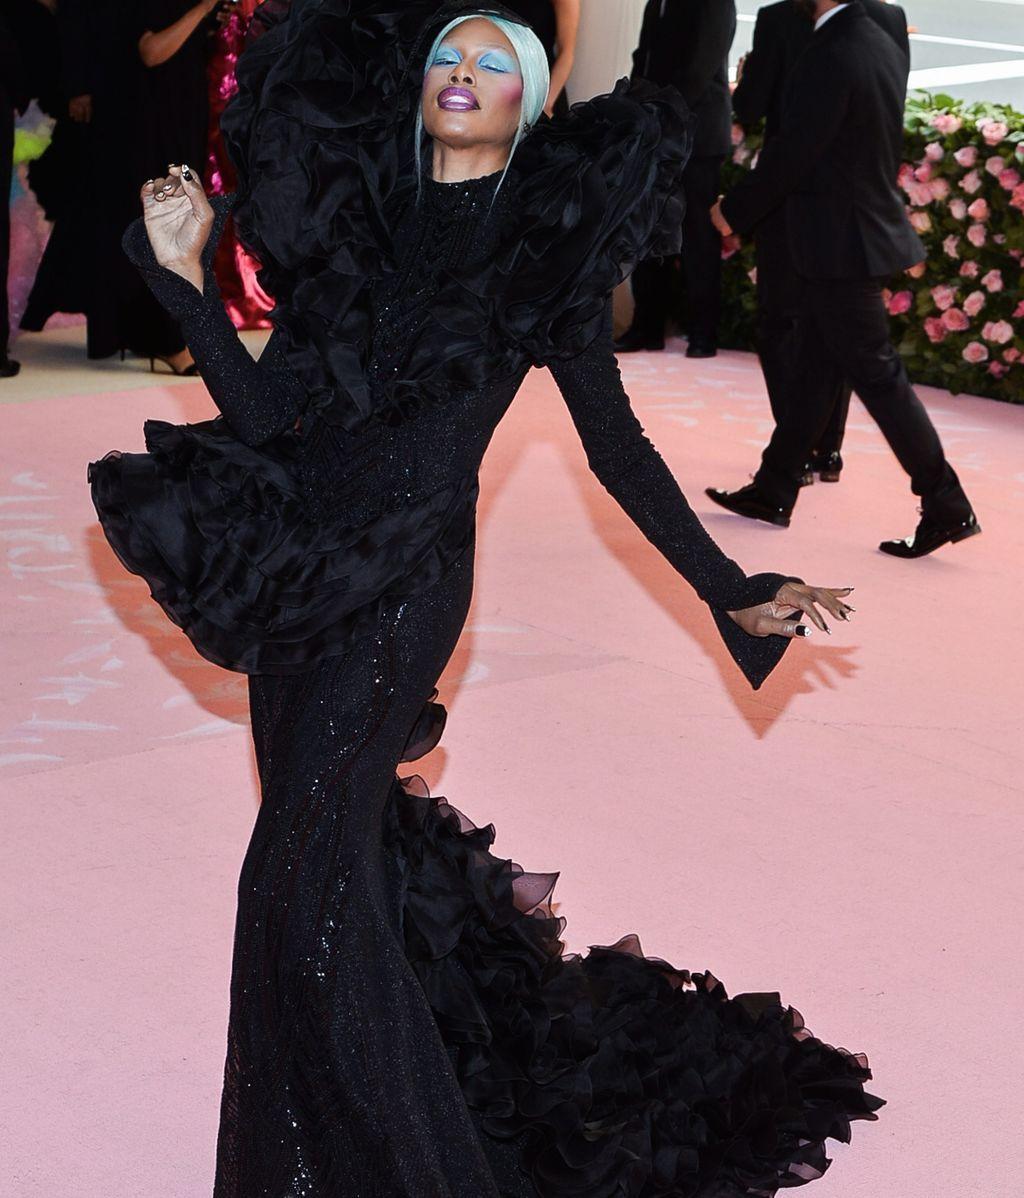 La actriz Laverne Cox, de la serie Orange is the new black, con vestido de Christian Siriano